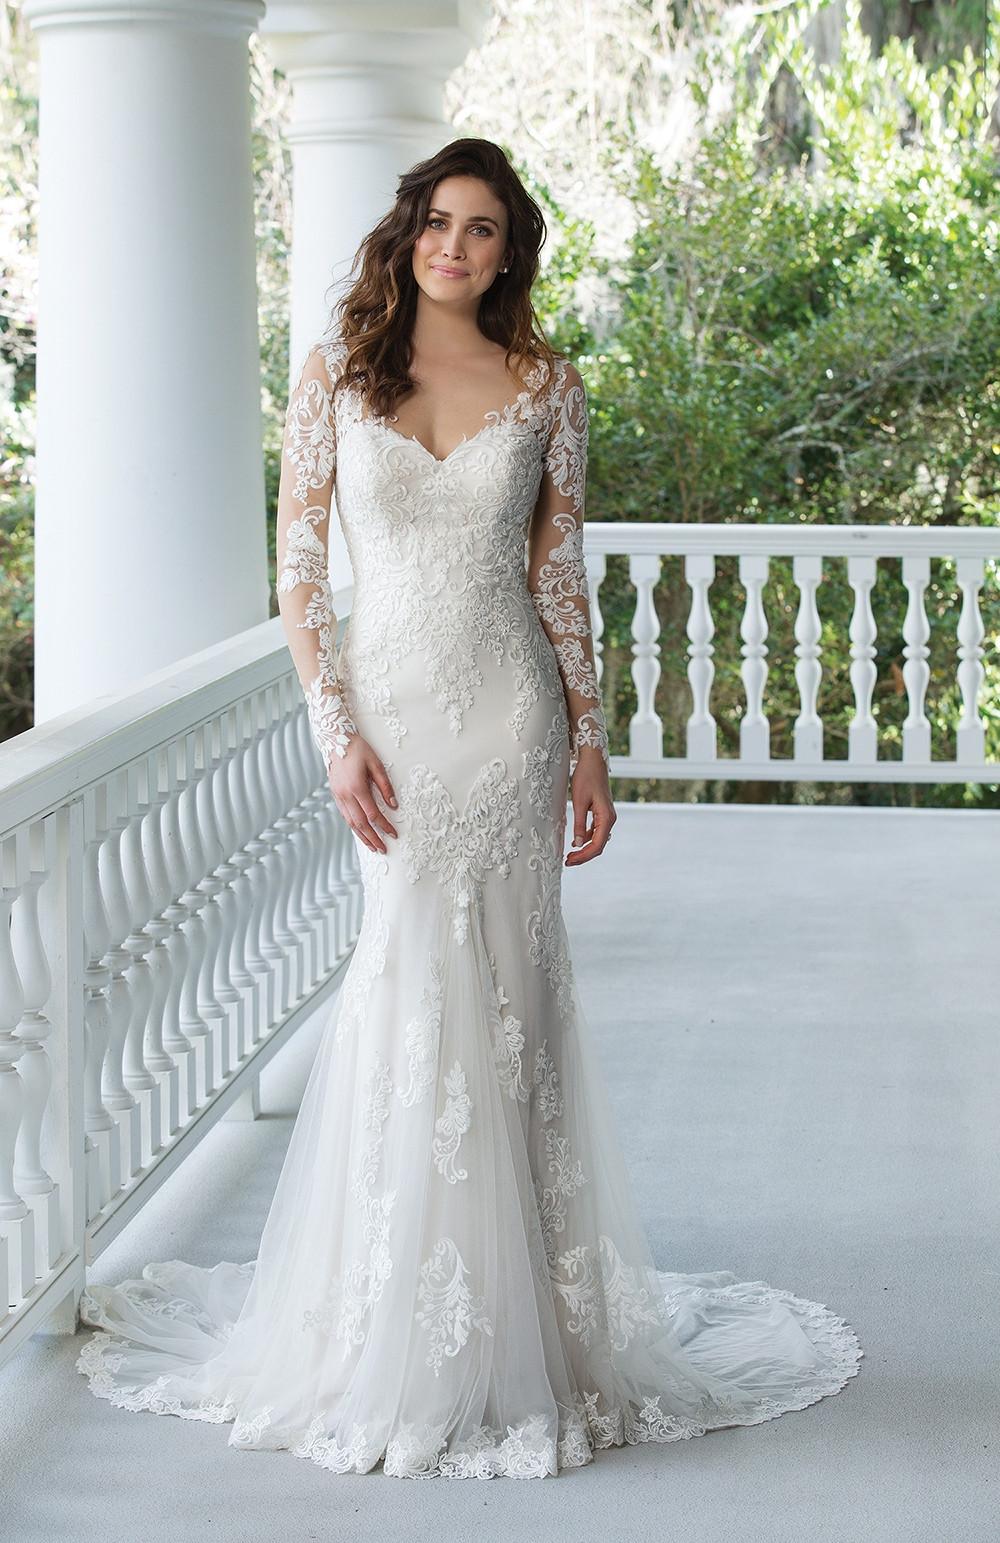 Dorable Wedding Dresses In Belfast Adornment - All Wedding Dresses ...